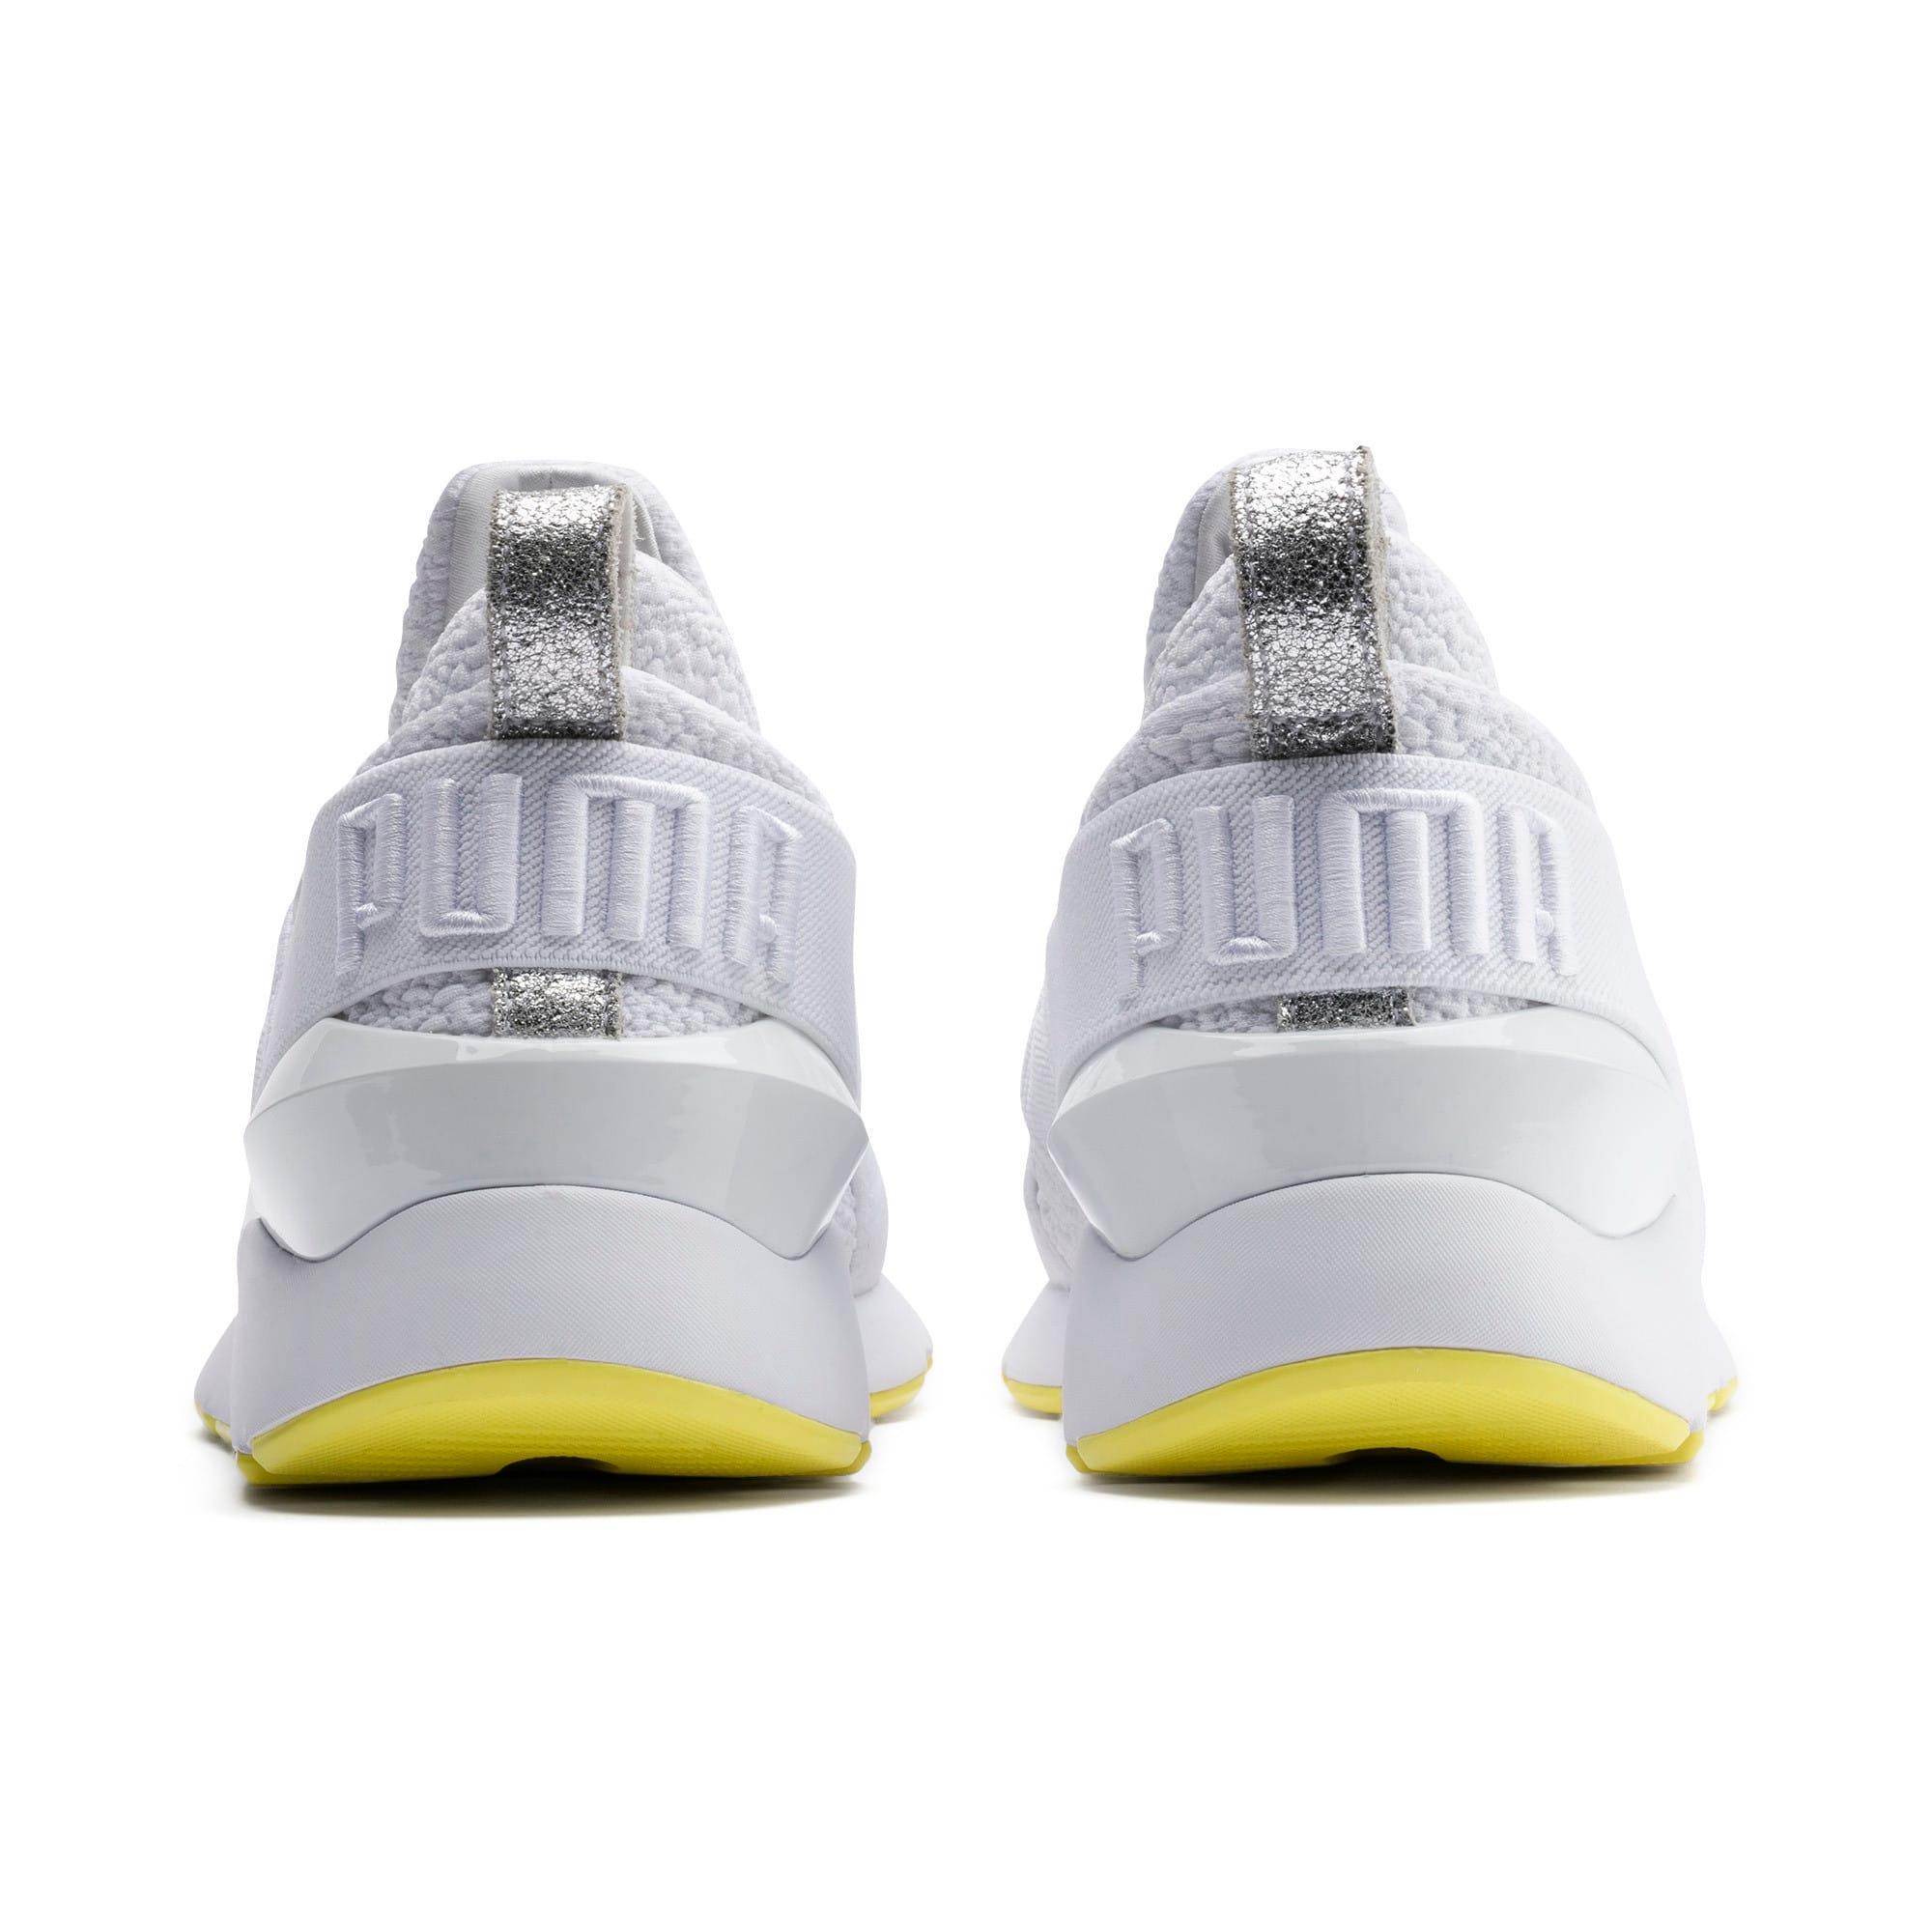 Thumbnail 3 of プーマ ミューズ TZ ウィメンズ, Puma White-Blazing Yellow, medium-JPN